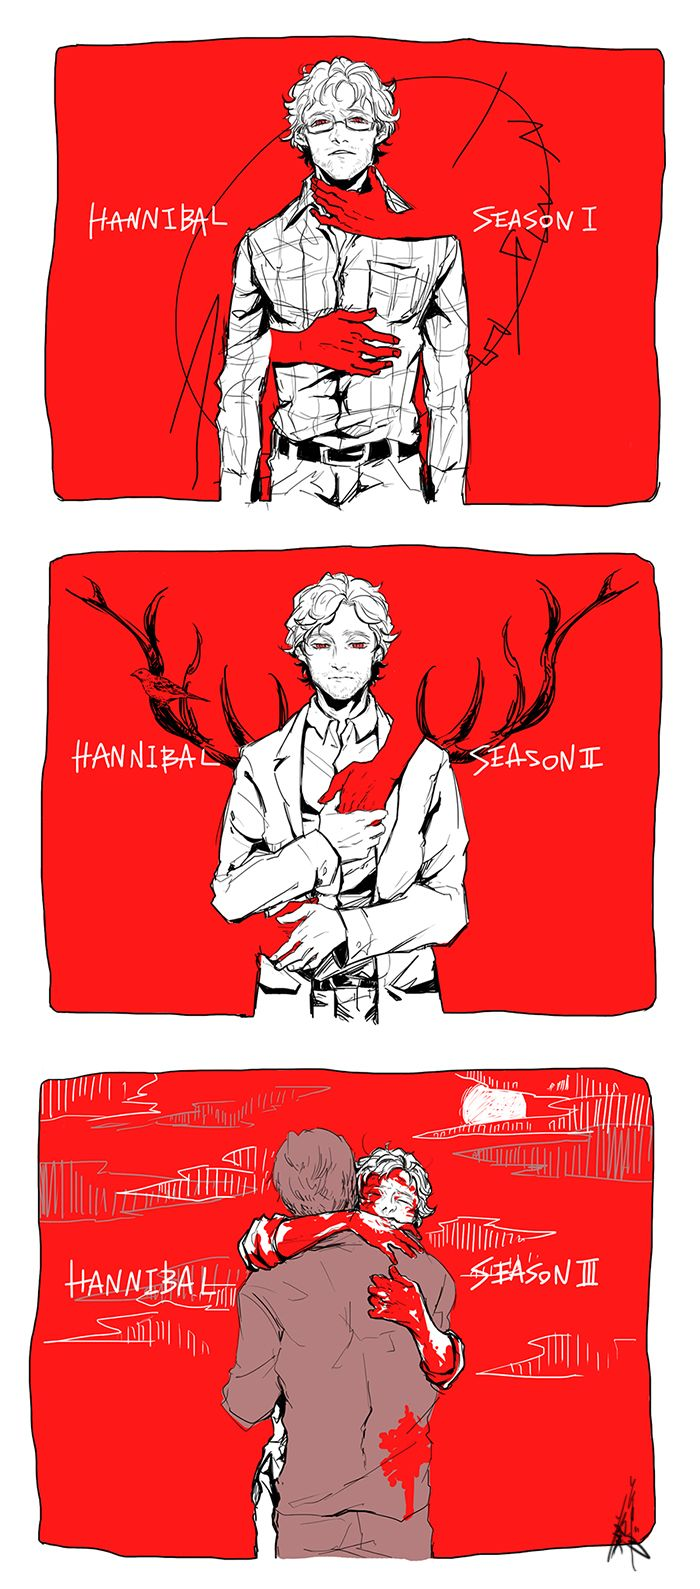 Hannigram season 1-2-3 brilliant artwork!!